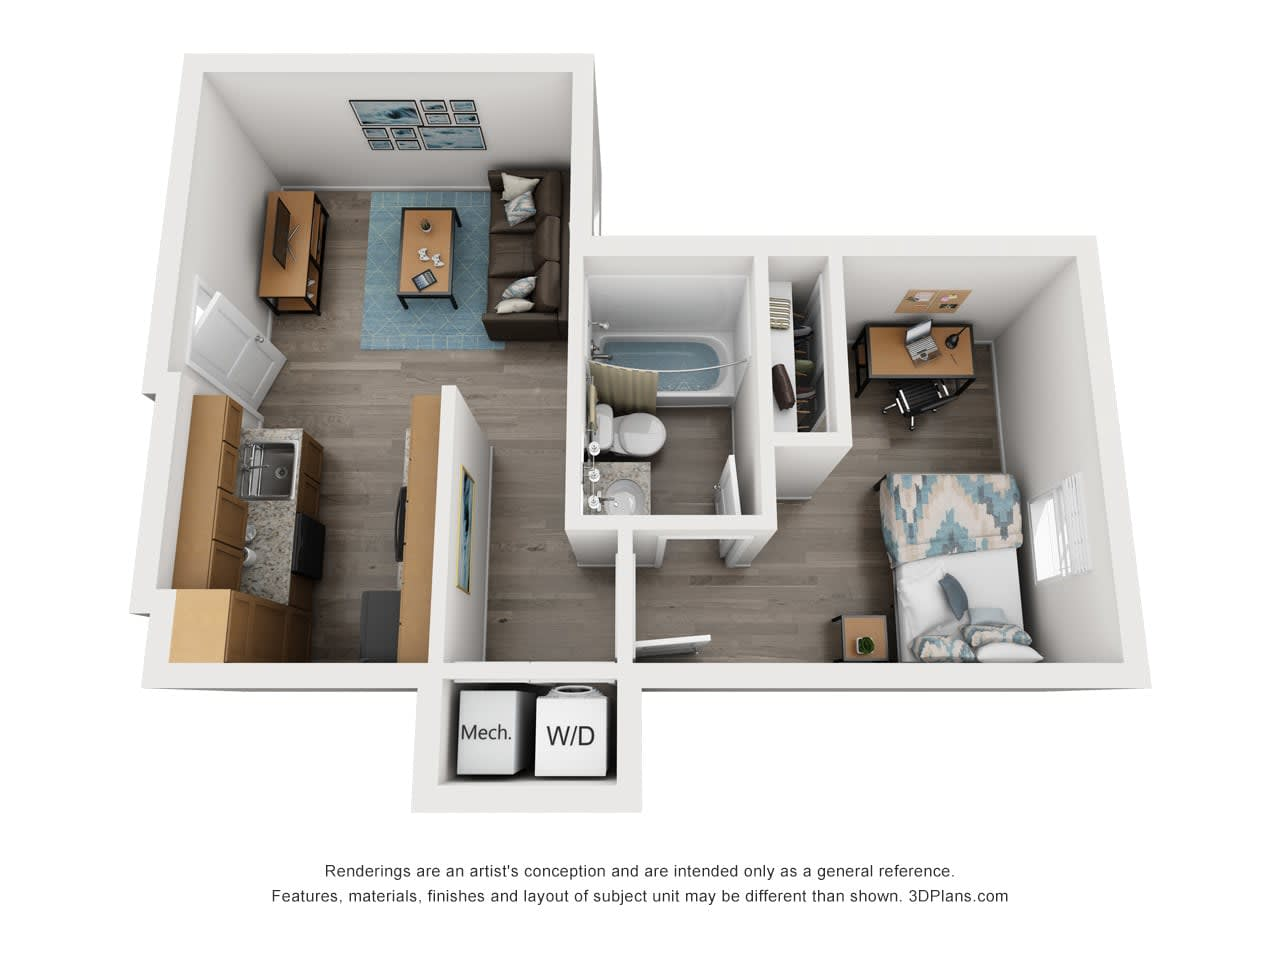 1, 2 & 4 Bedroom Student Apartments in Salisbury, MD